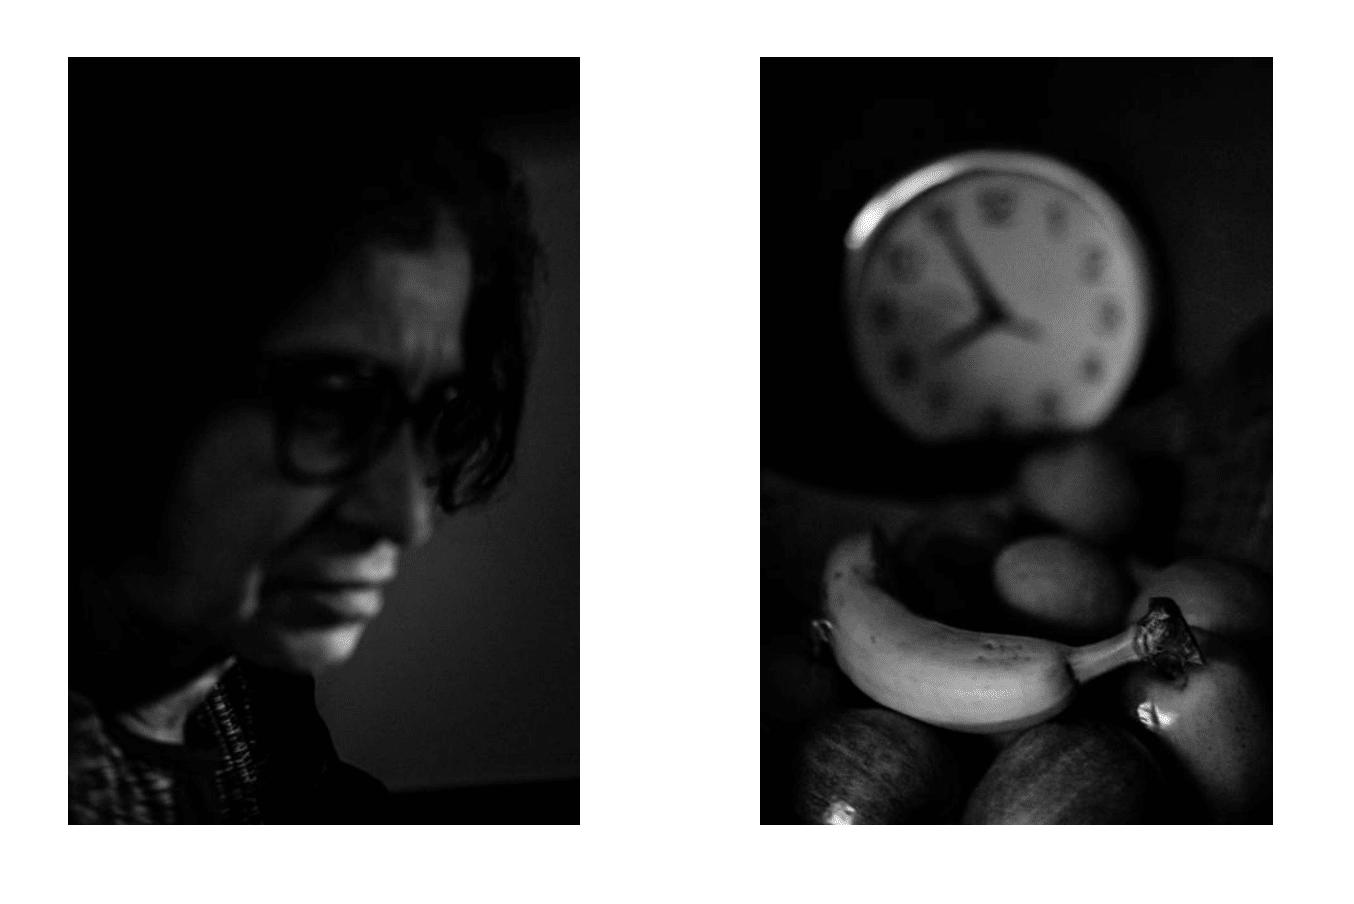 « Fiction of reality », le projet du photographe M'hammed Kilito